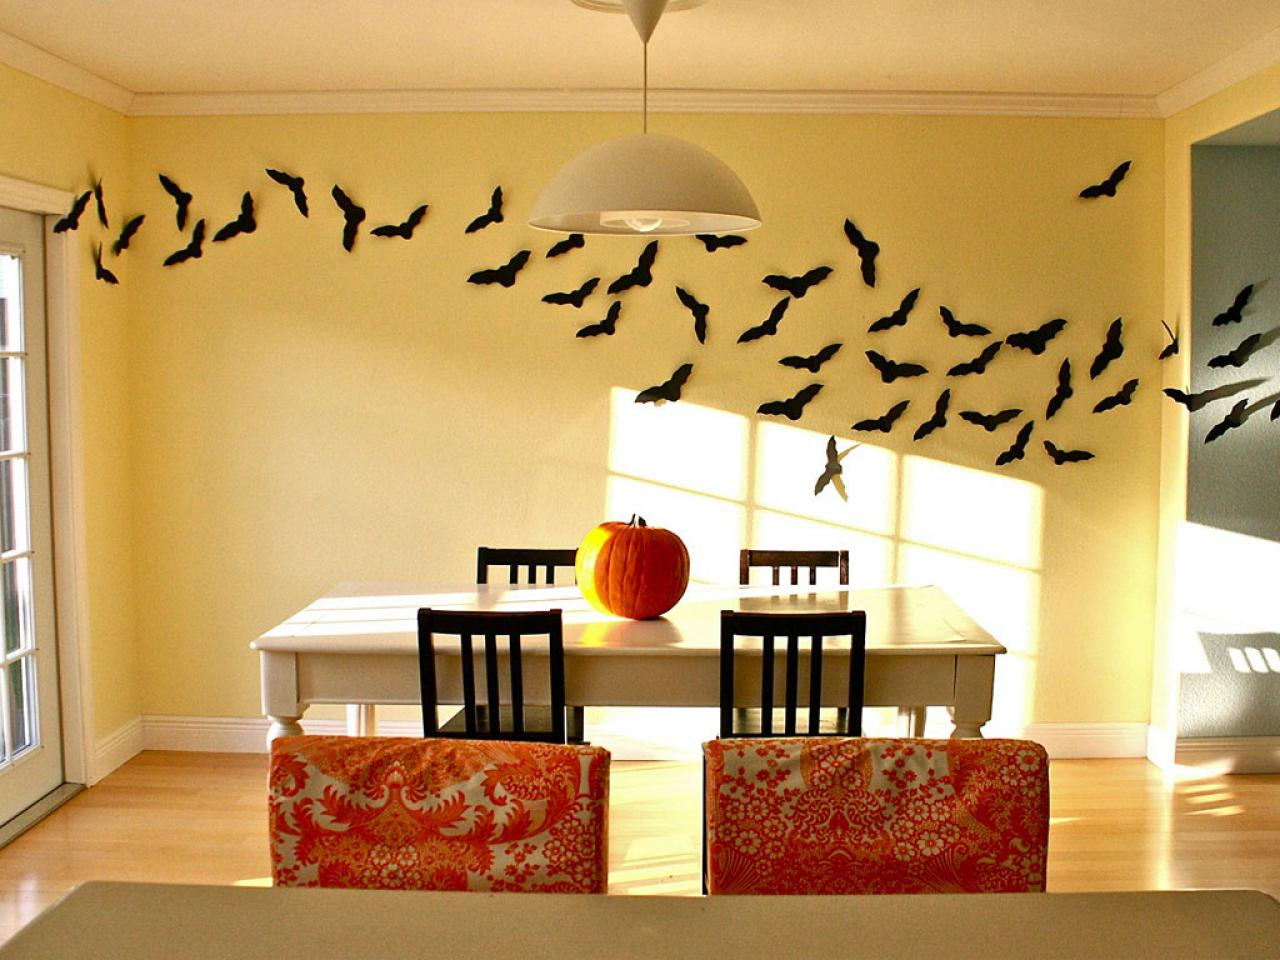 Dekorasi Halloween dengan DIY papercutting (Sumber: hgtv.com)